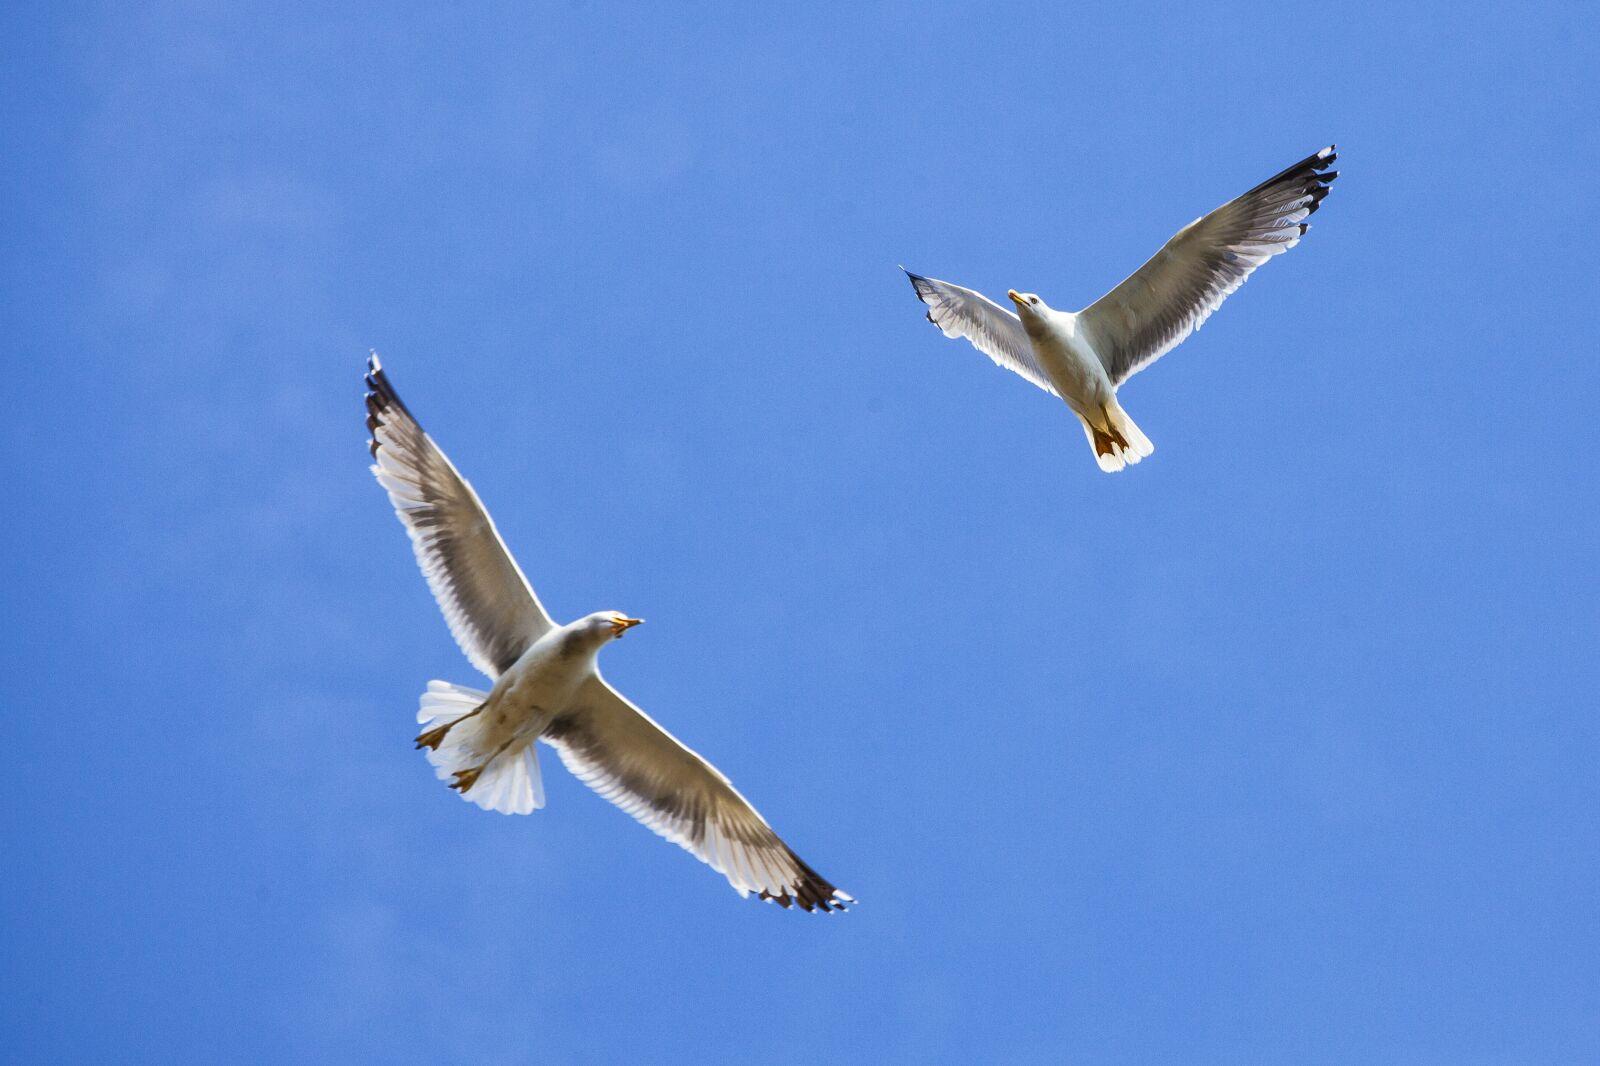 seagulls, sky, birds